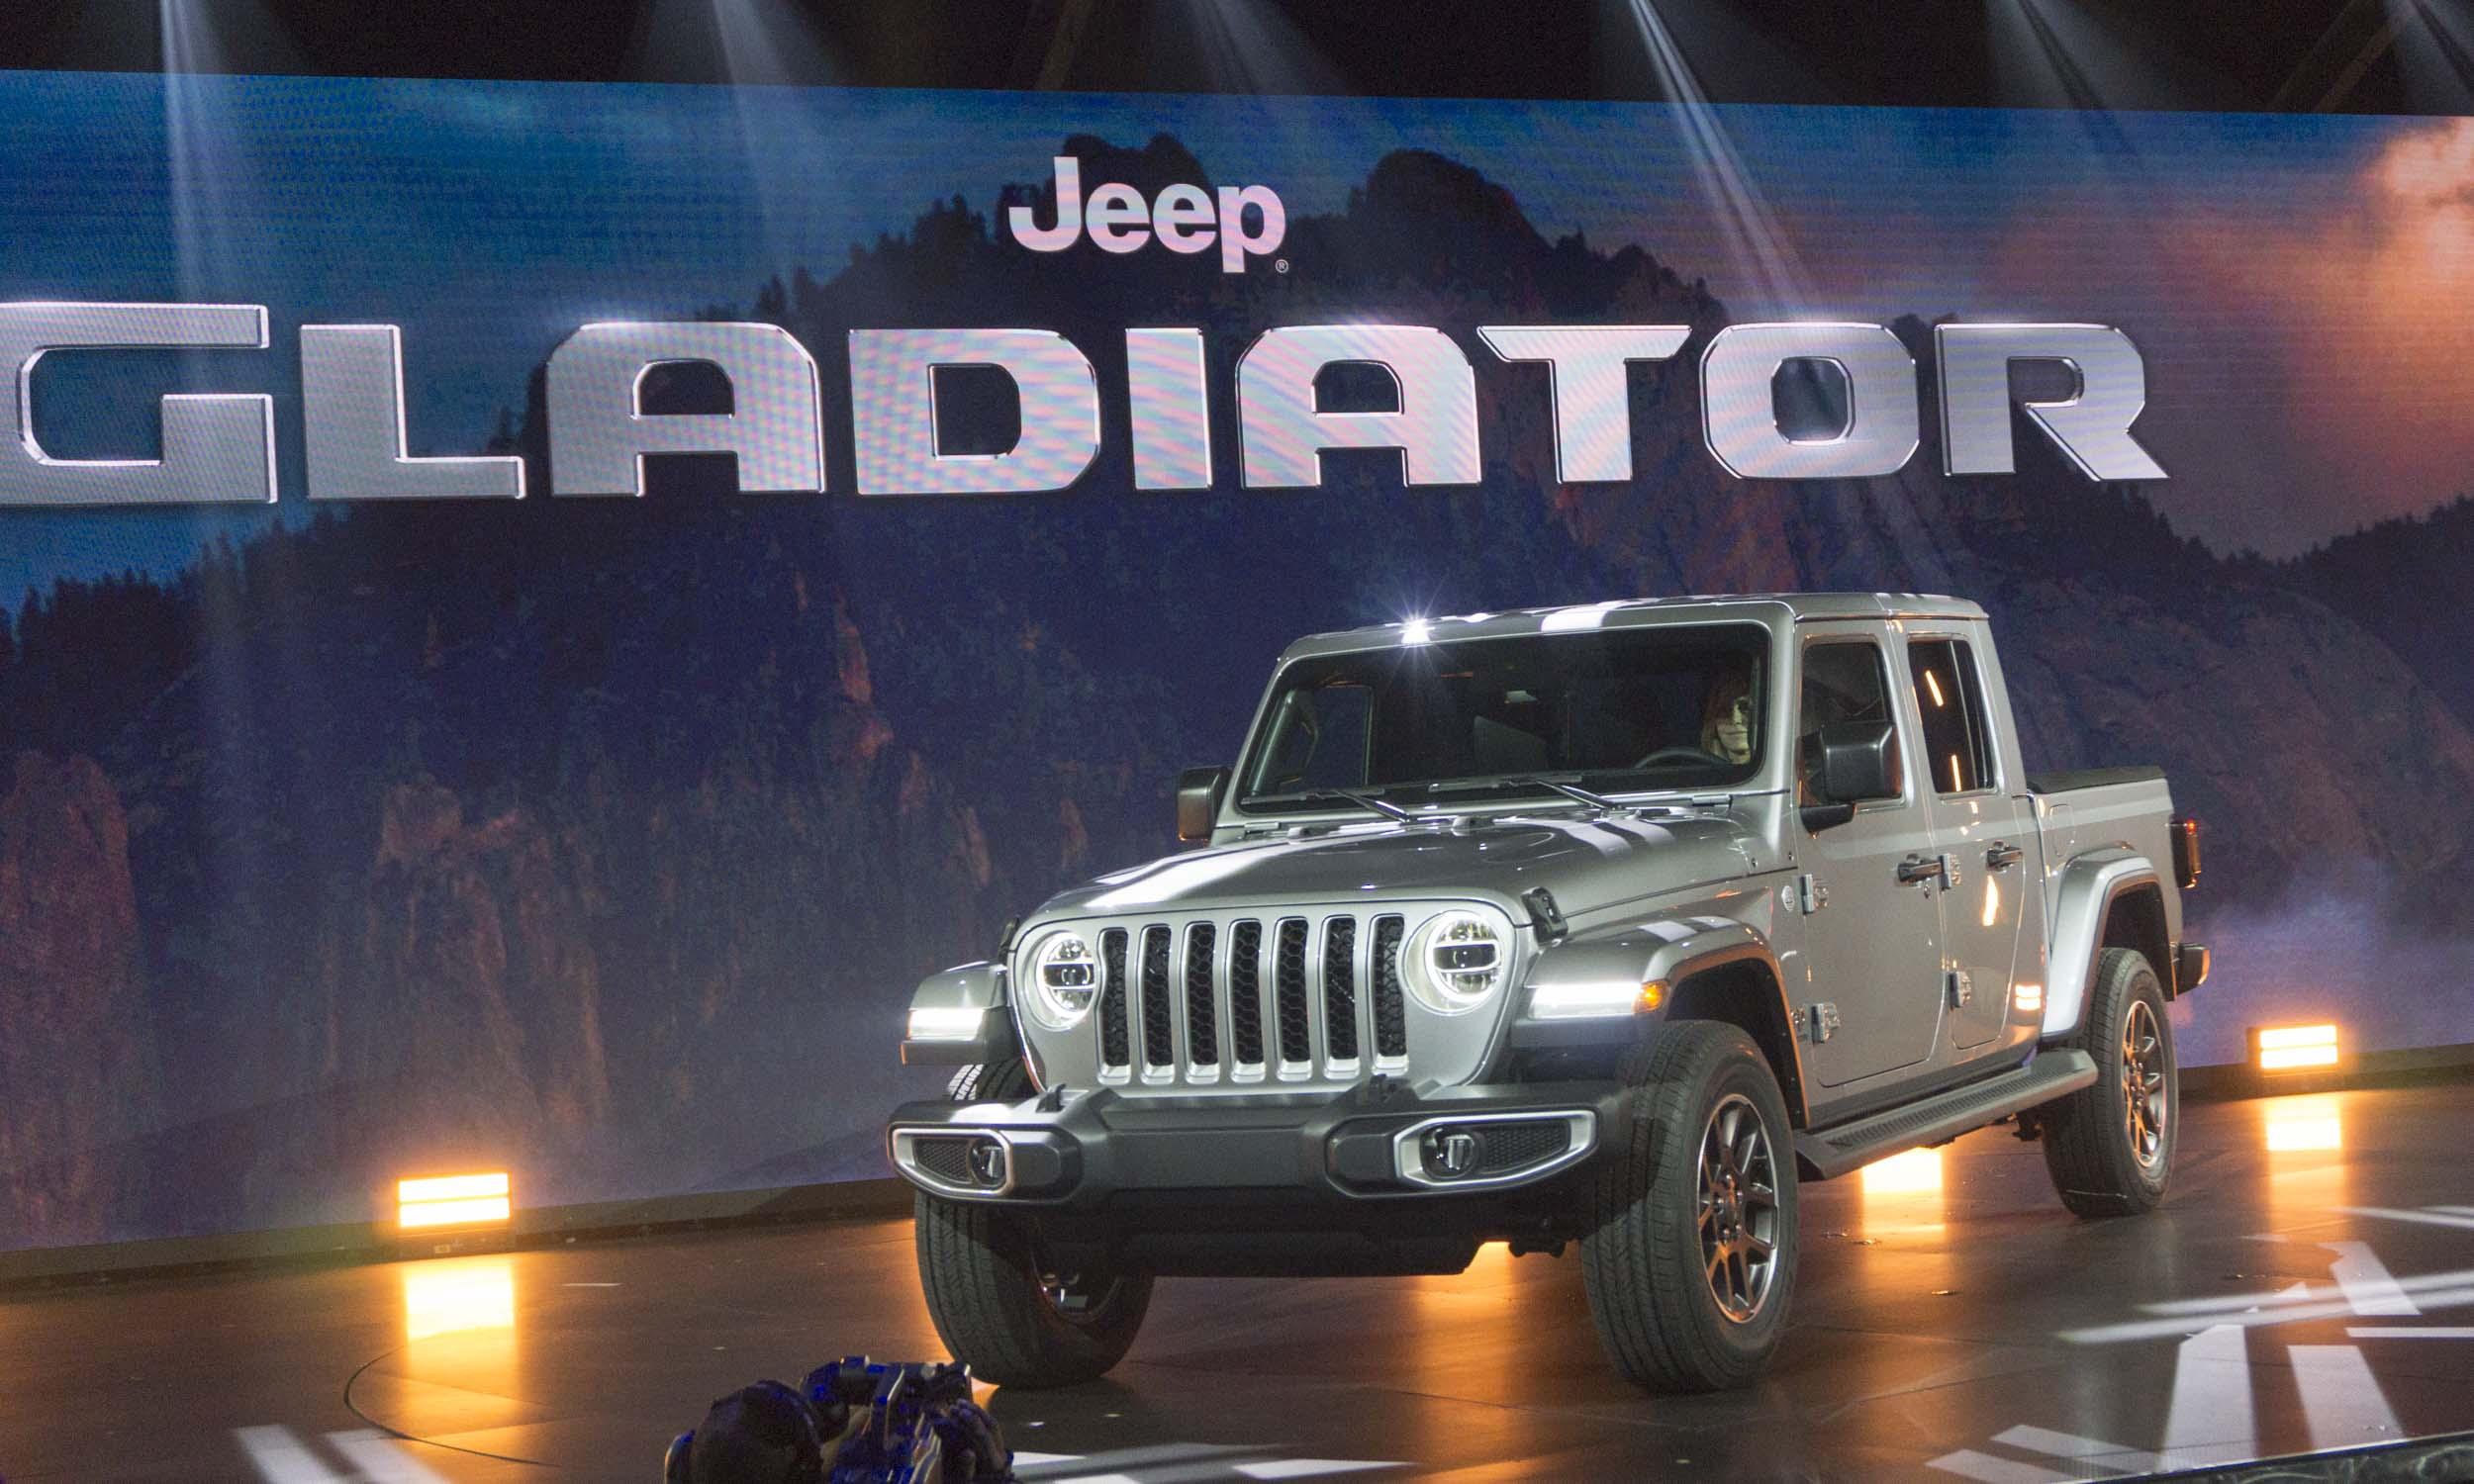 2018 LA Auto Show 2020 Jeep Gladiatornbsp